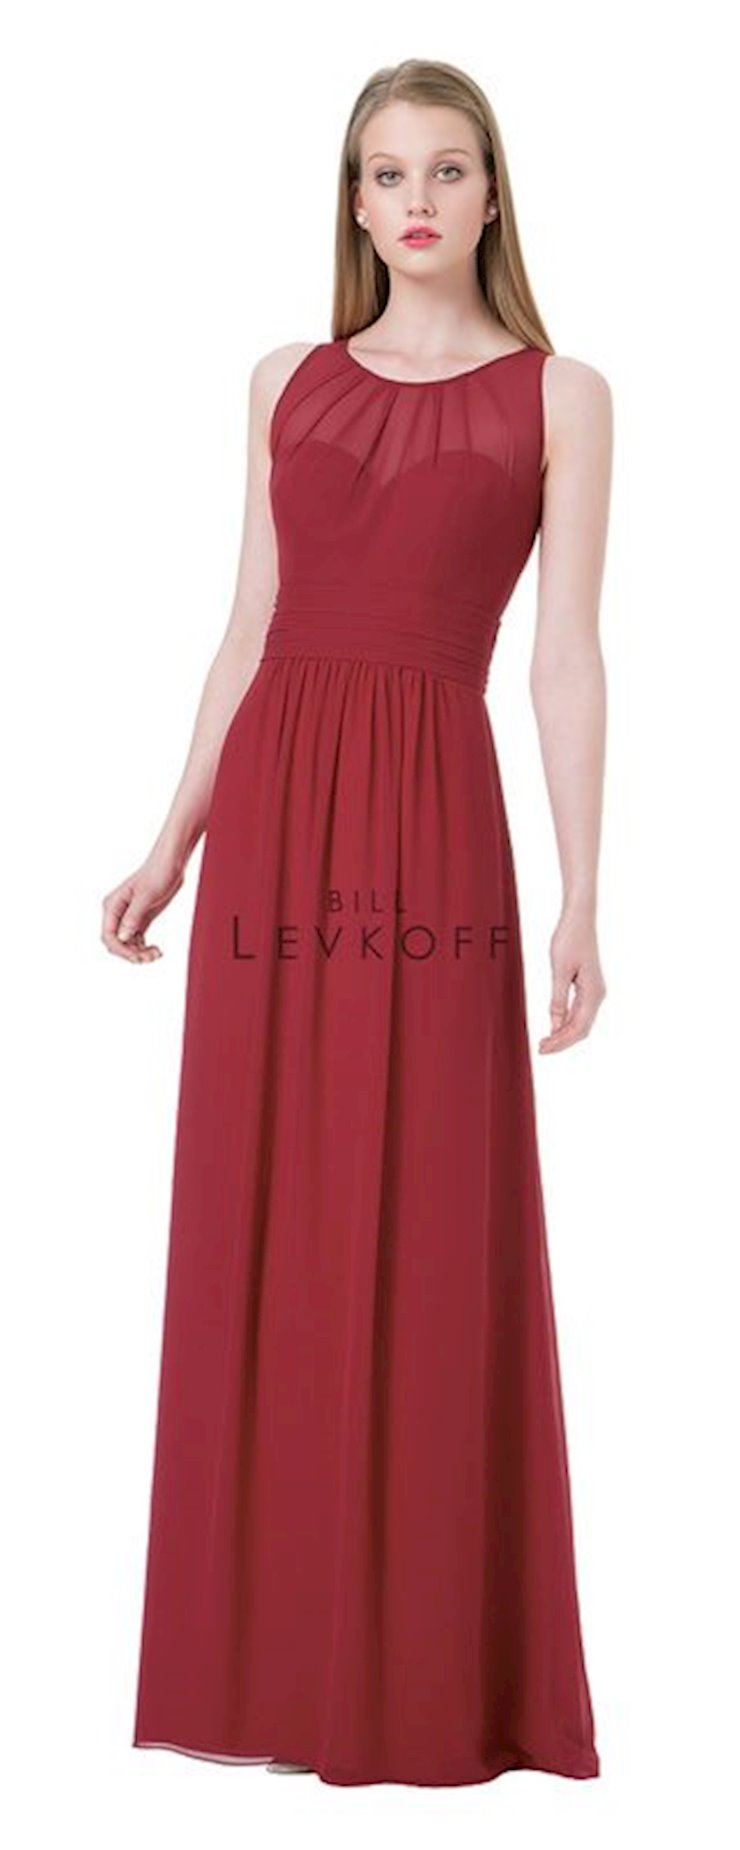 Bill Levkoff Style #1204